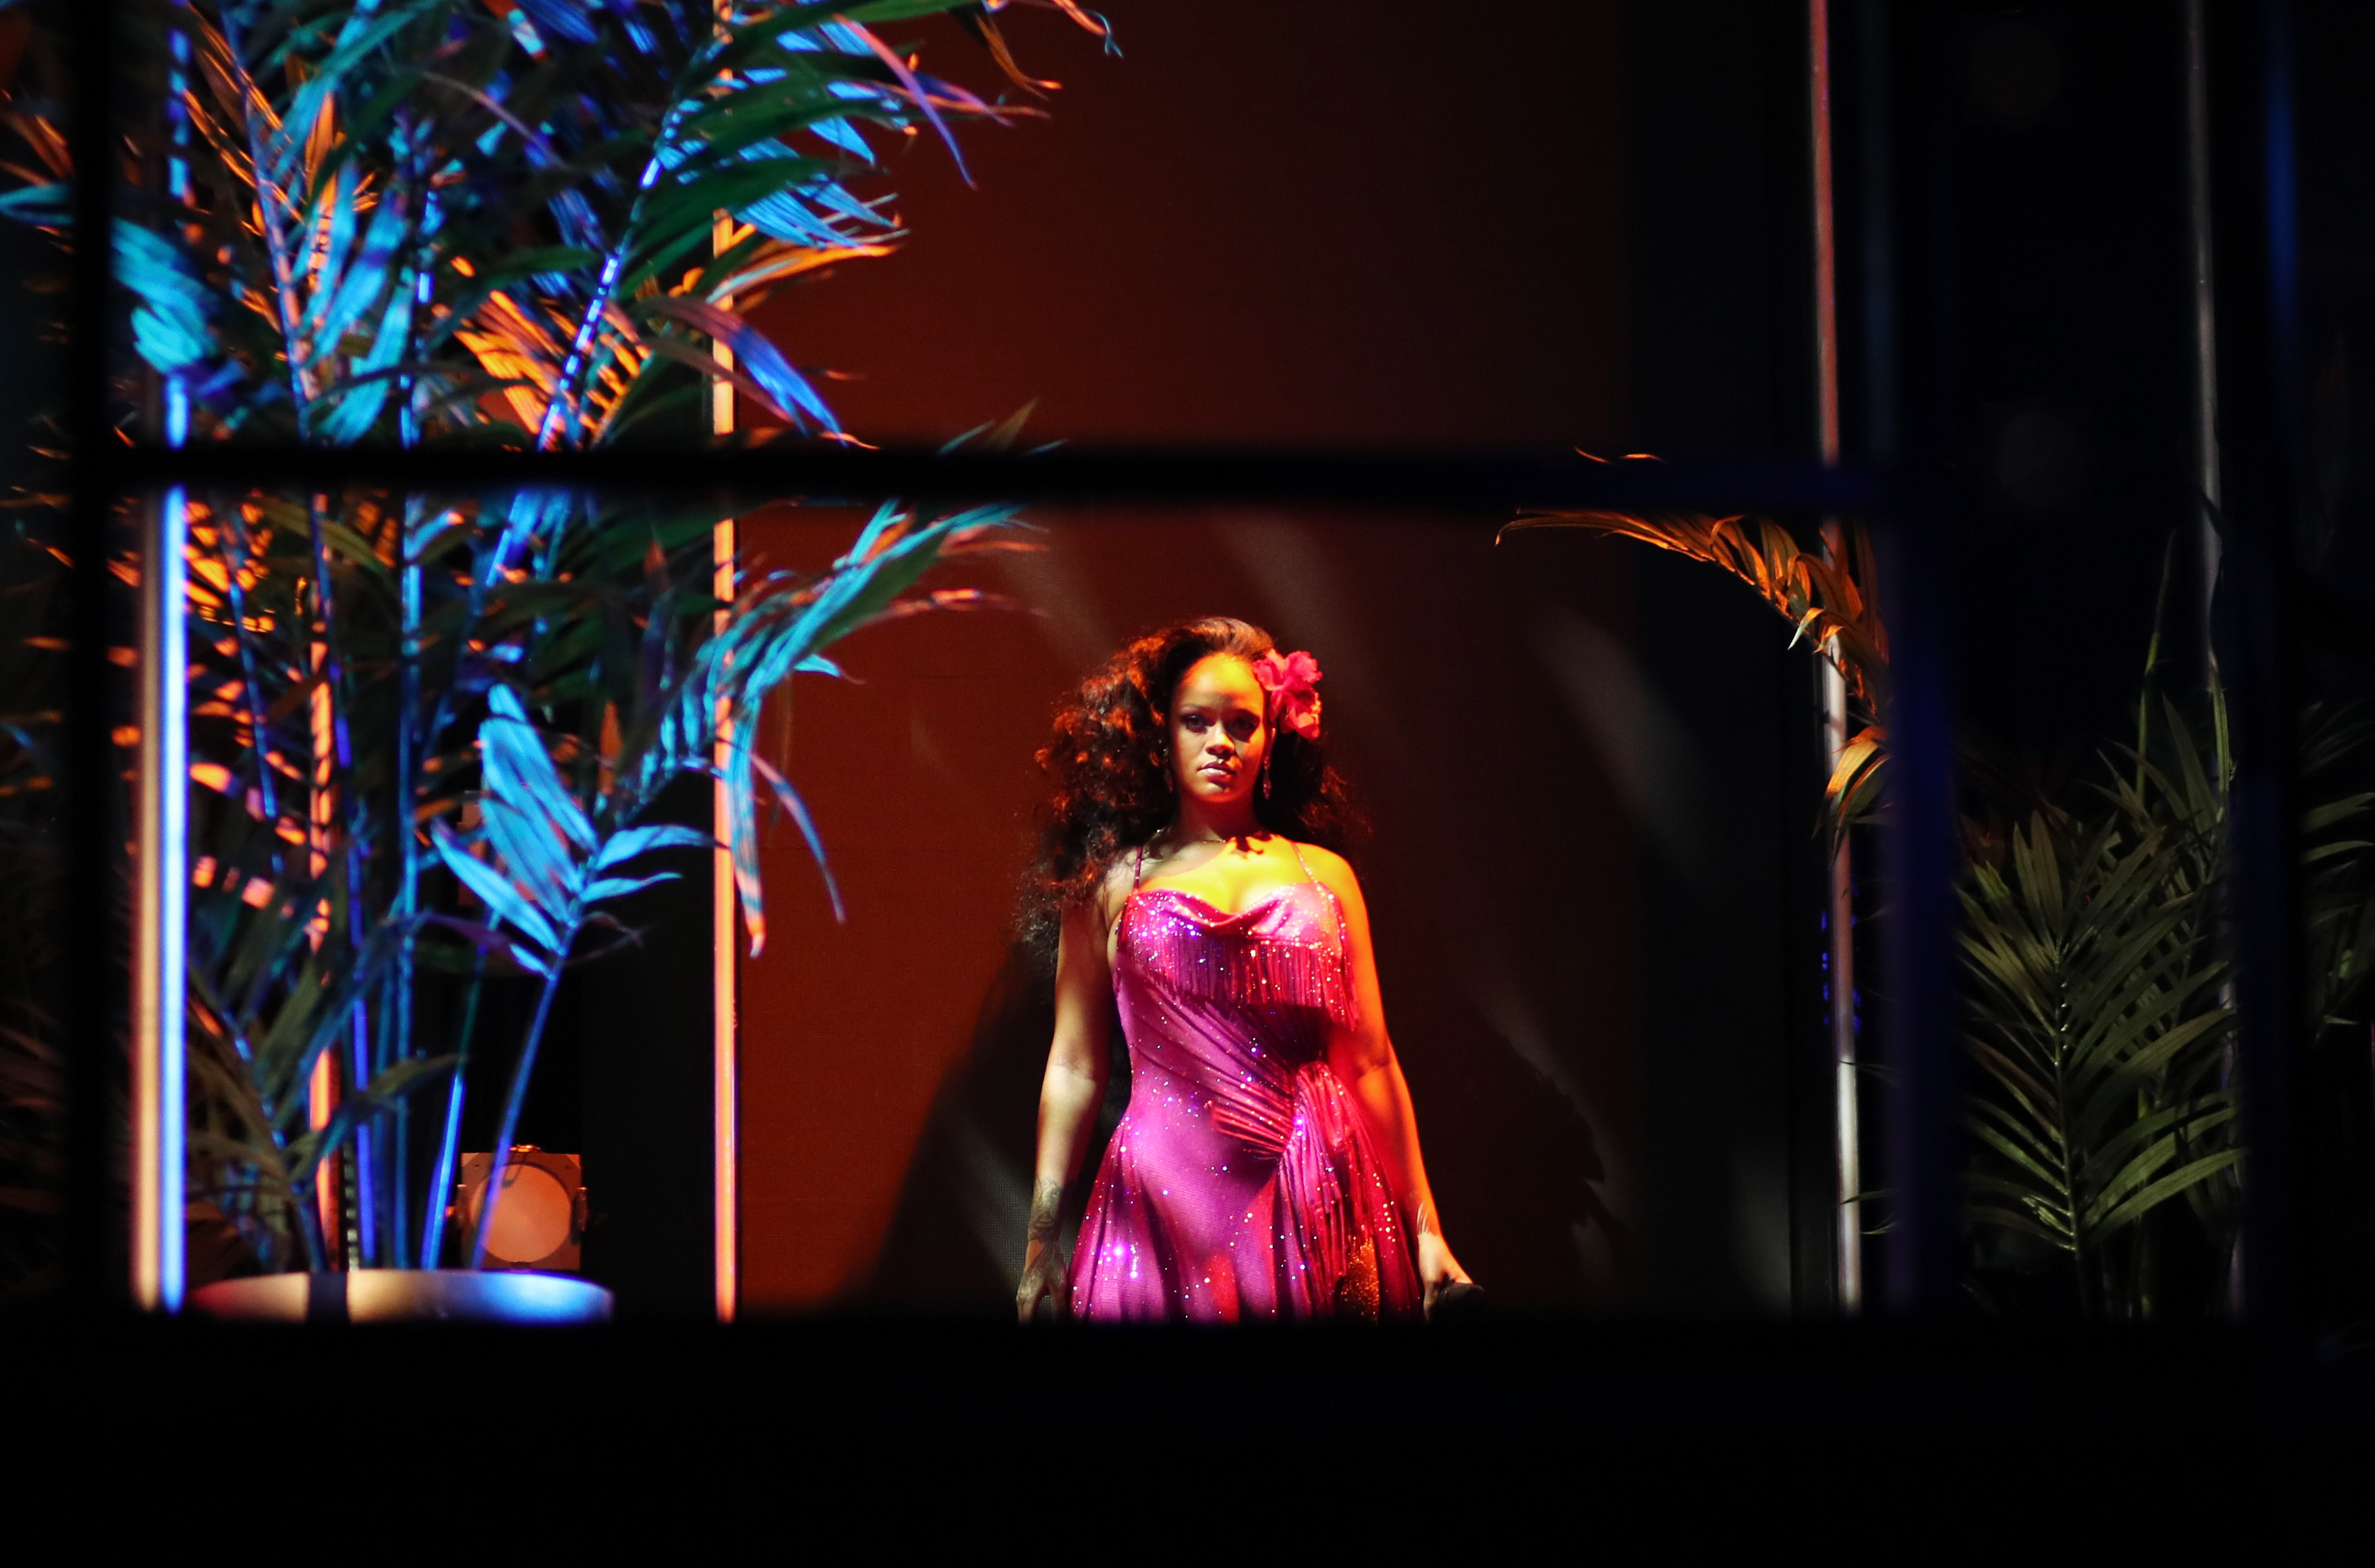 Rihanna & Childish Gambino Were Seen in Cuba Filming a Secret Project Called 'Guava Island'